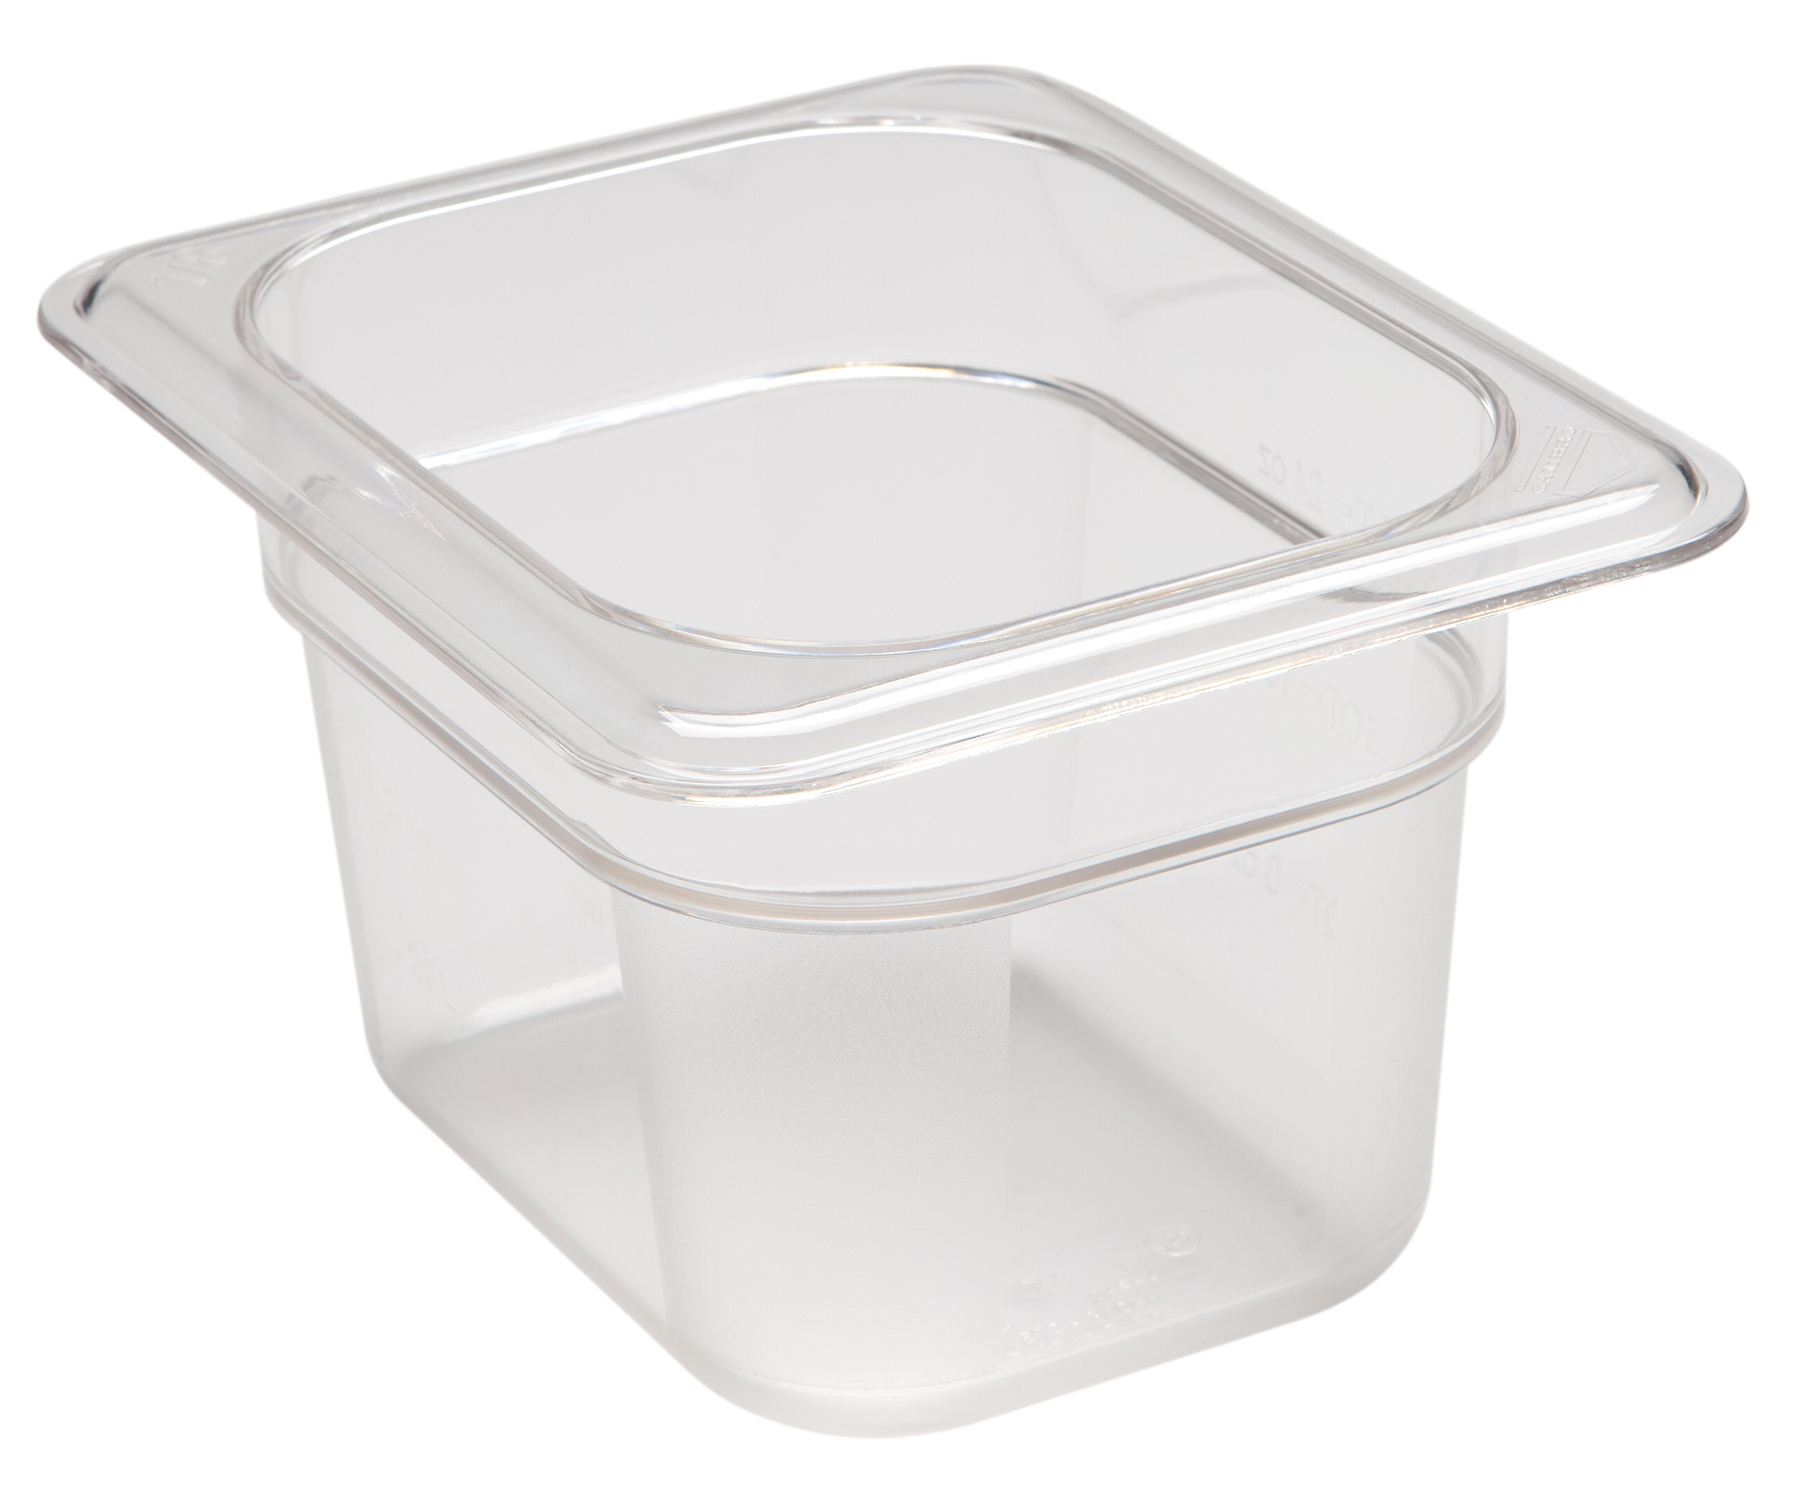 Cambro 84CW135 food/beverage storage container